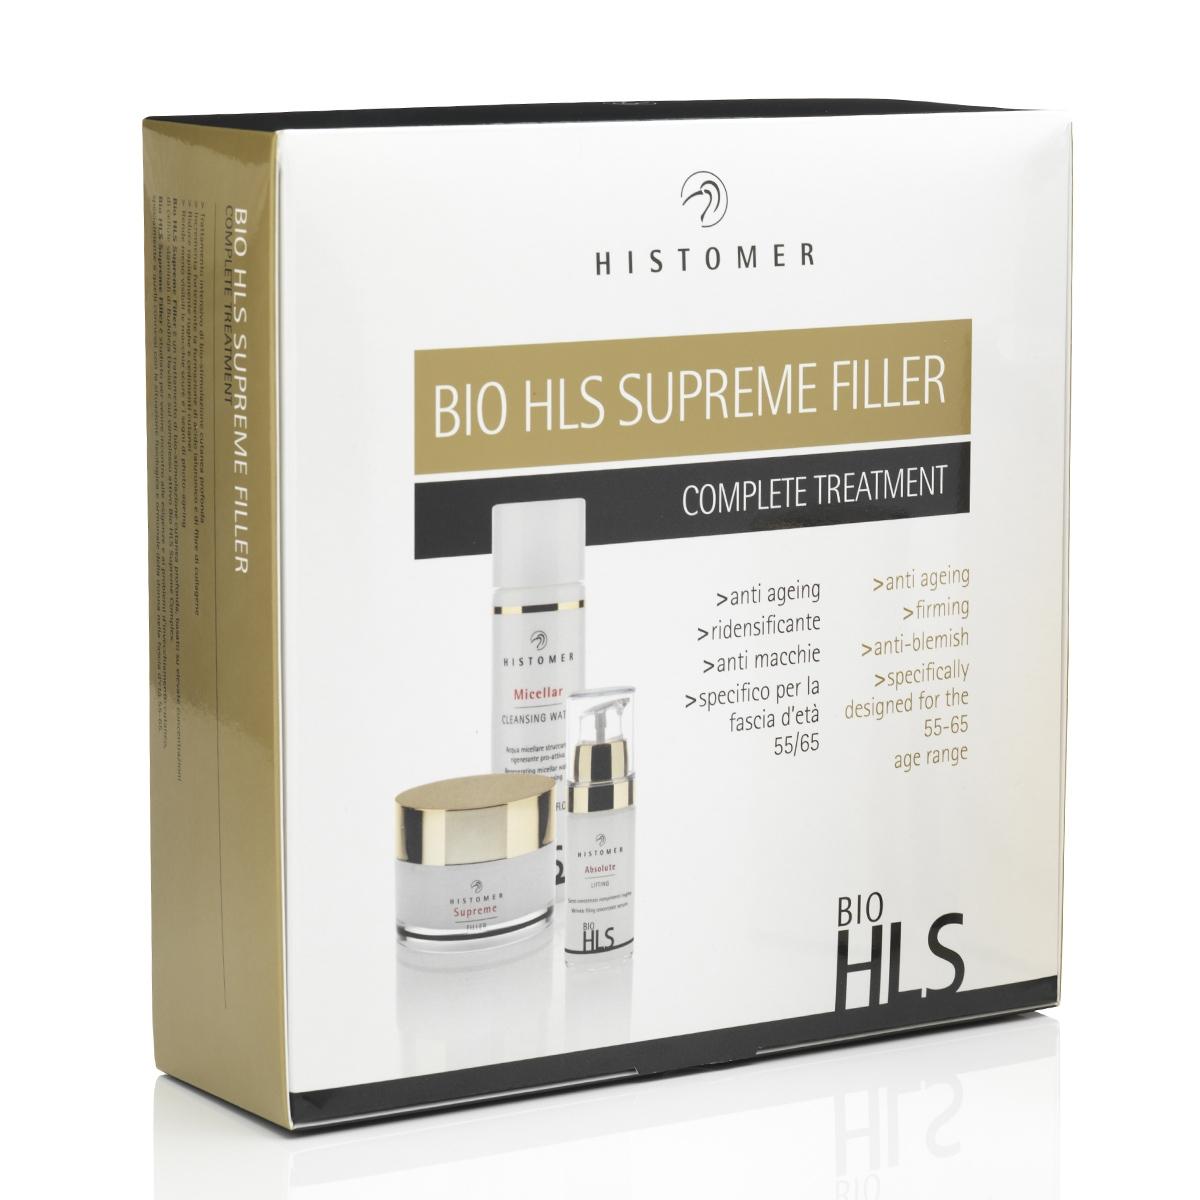 Histomer Комплексный Уход Supreme Filler  Treatment, 250 мл+50 мл+30 мл